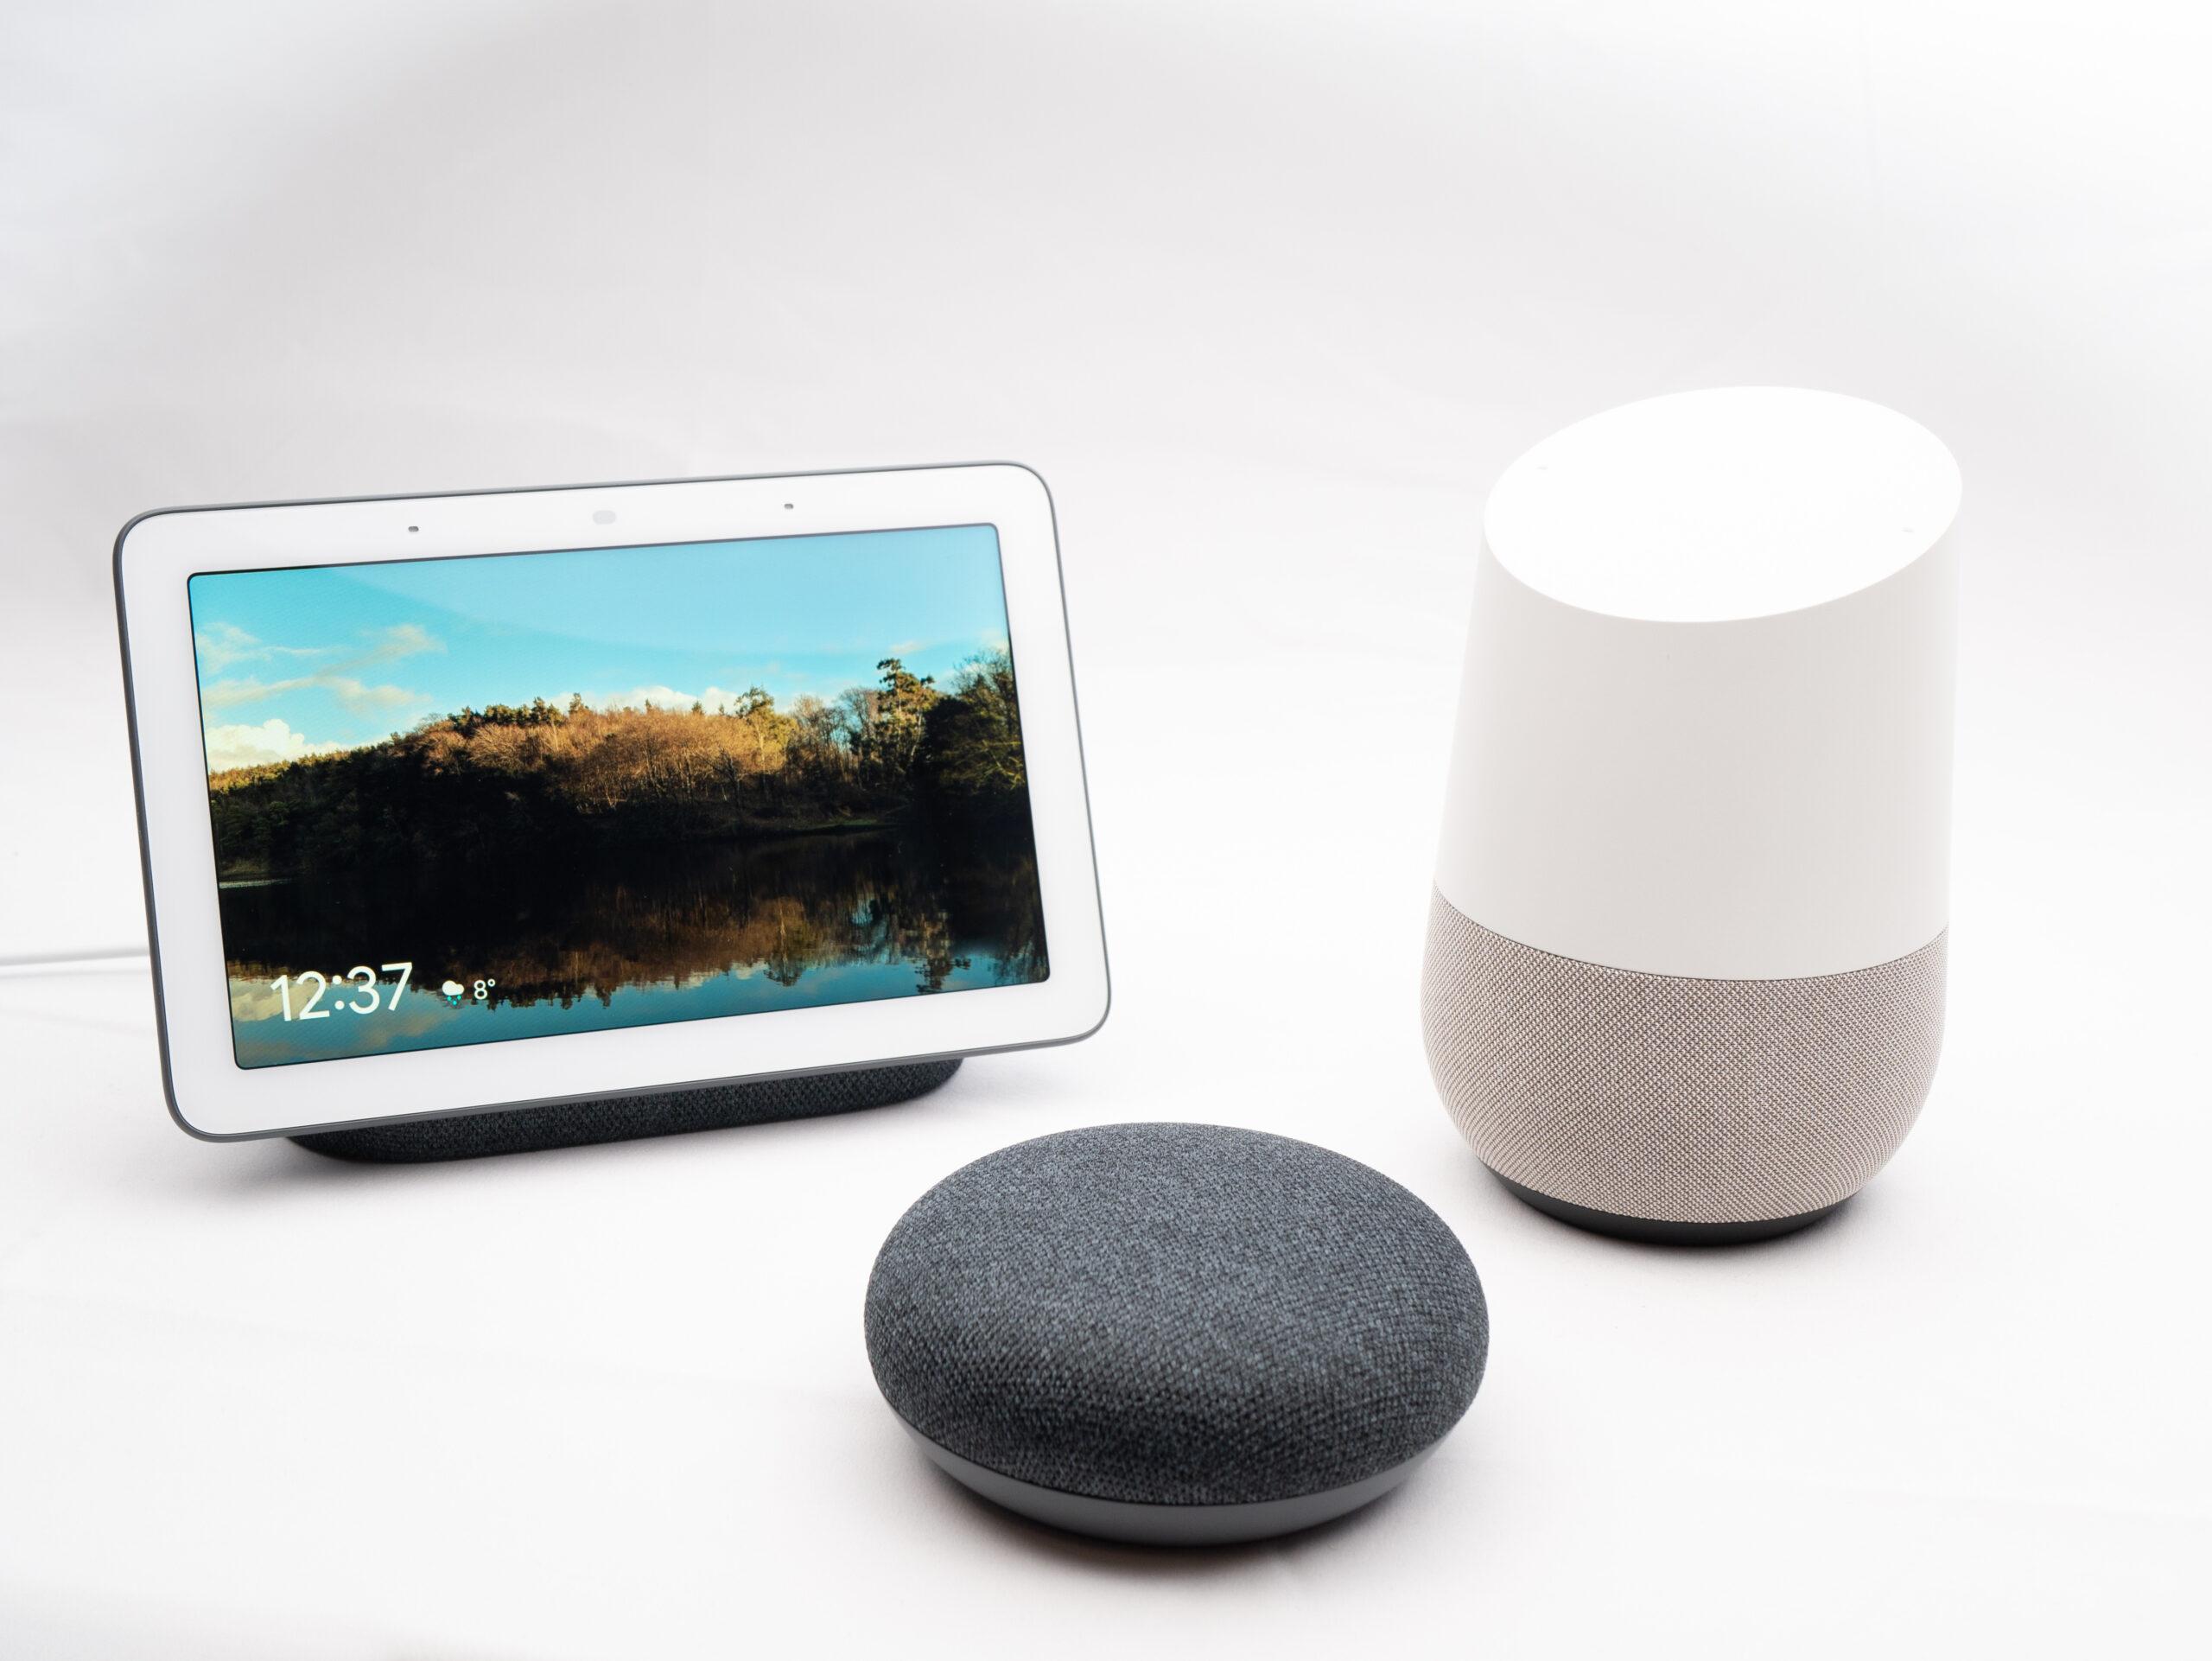 smart home devices google home ment alexa dot